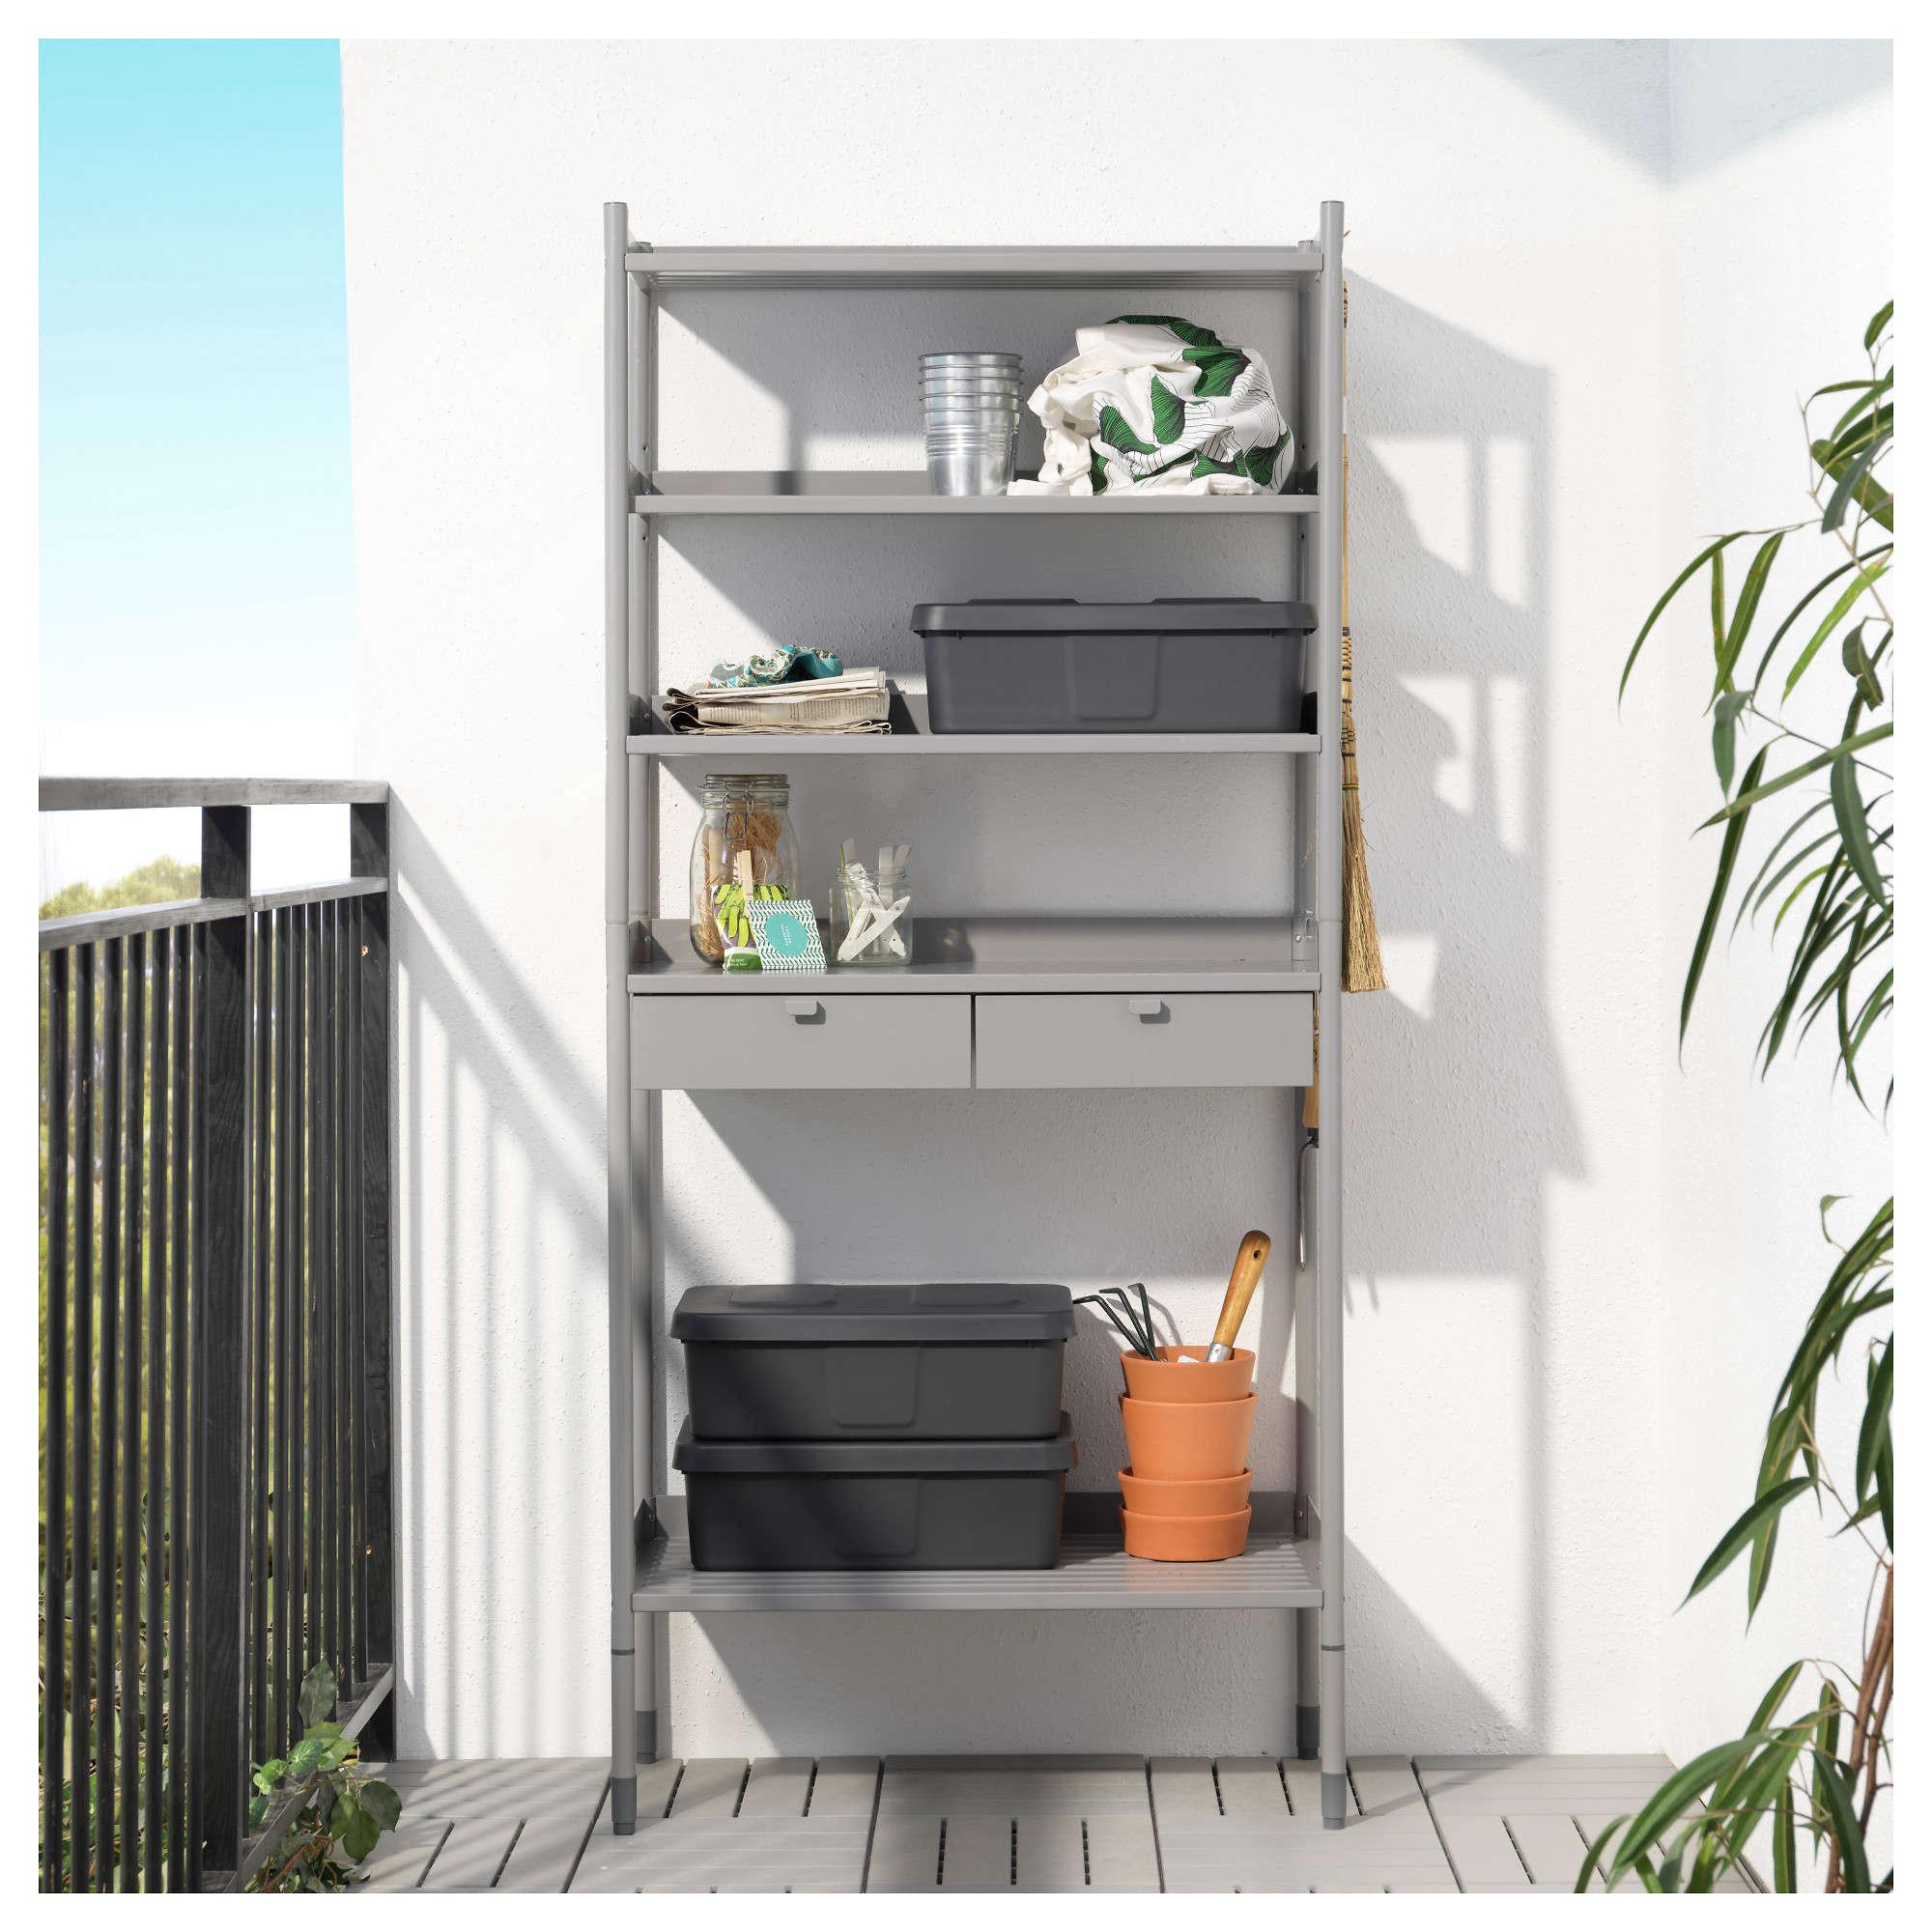 Ikea Jardin Muebles Roubaix Maison Design Trivid Us # Muebles Bajo Lavabo Ikea